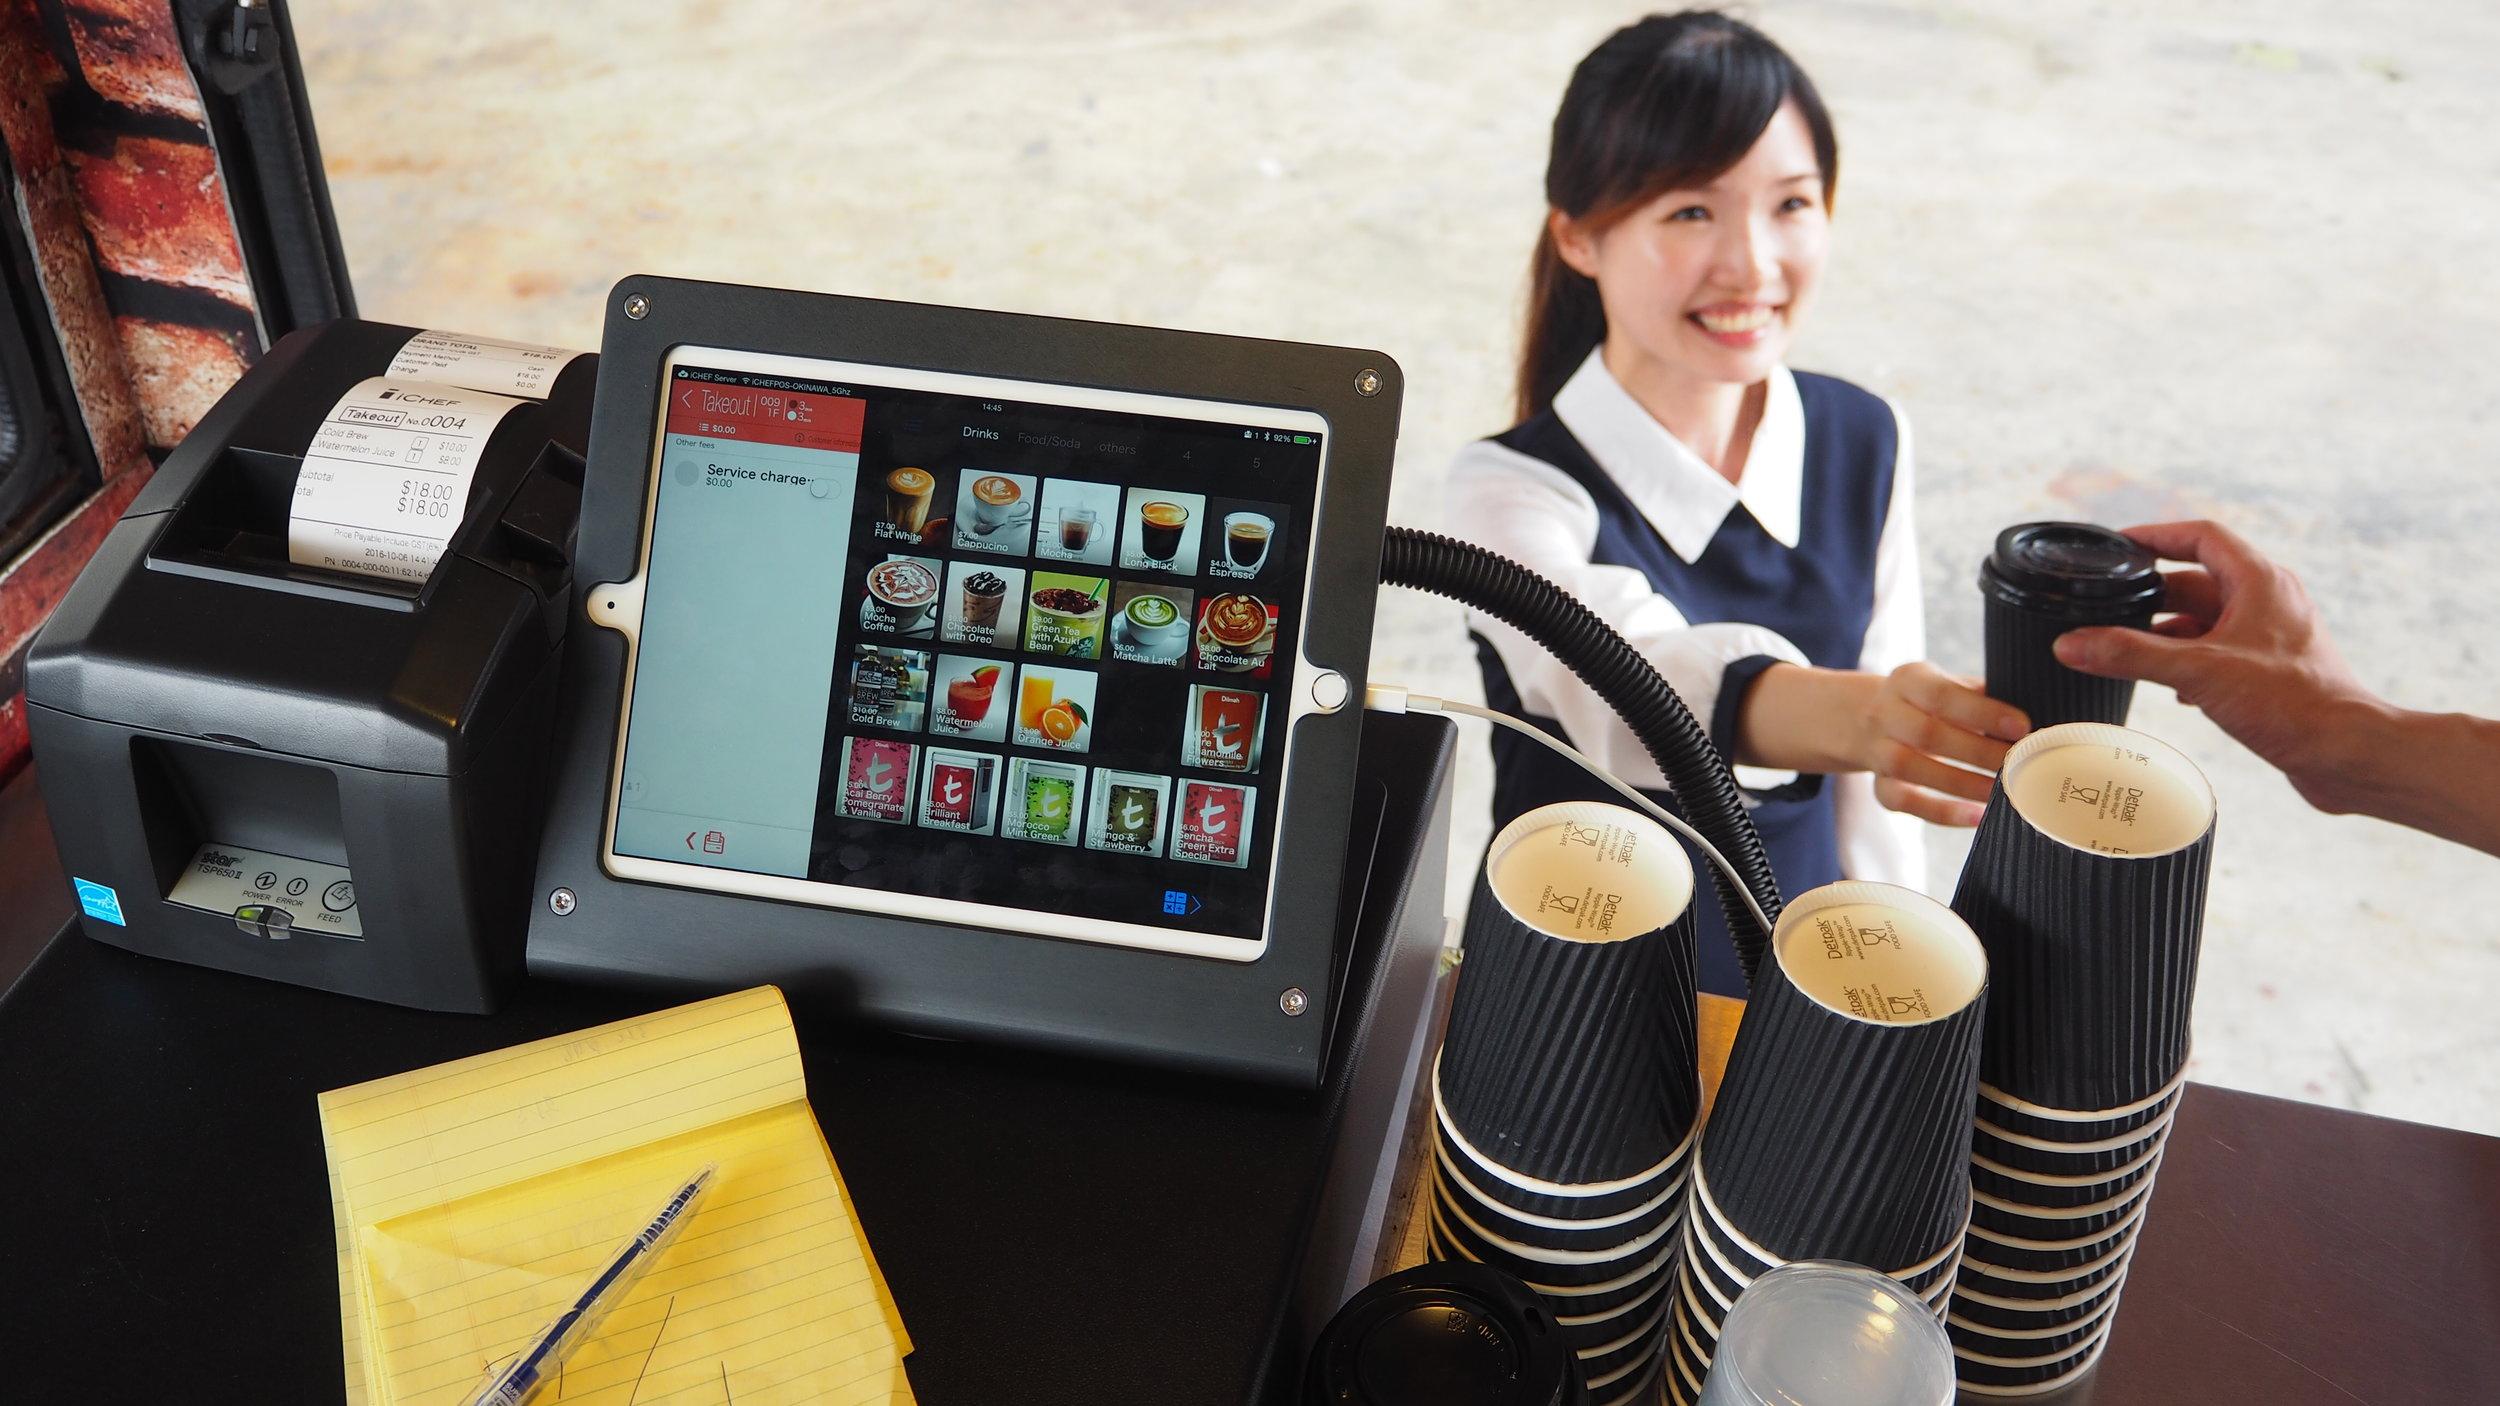 iCHEF POS 系統在餐車櫃檯上不佔空間,直接做點餐、結帳、出餐